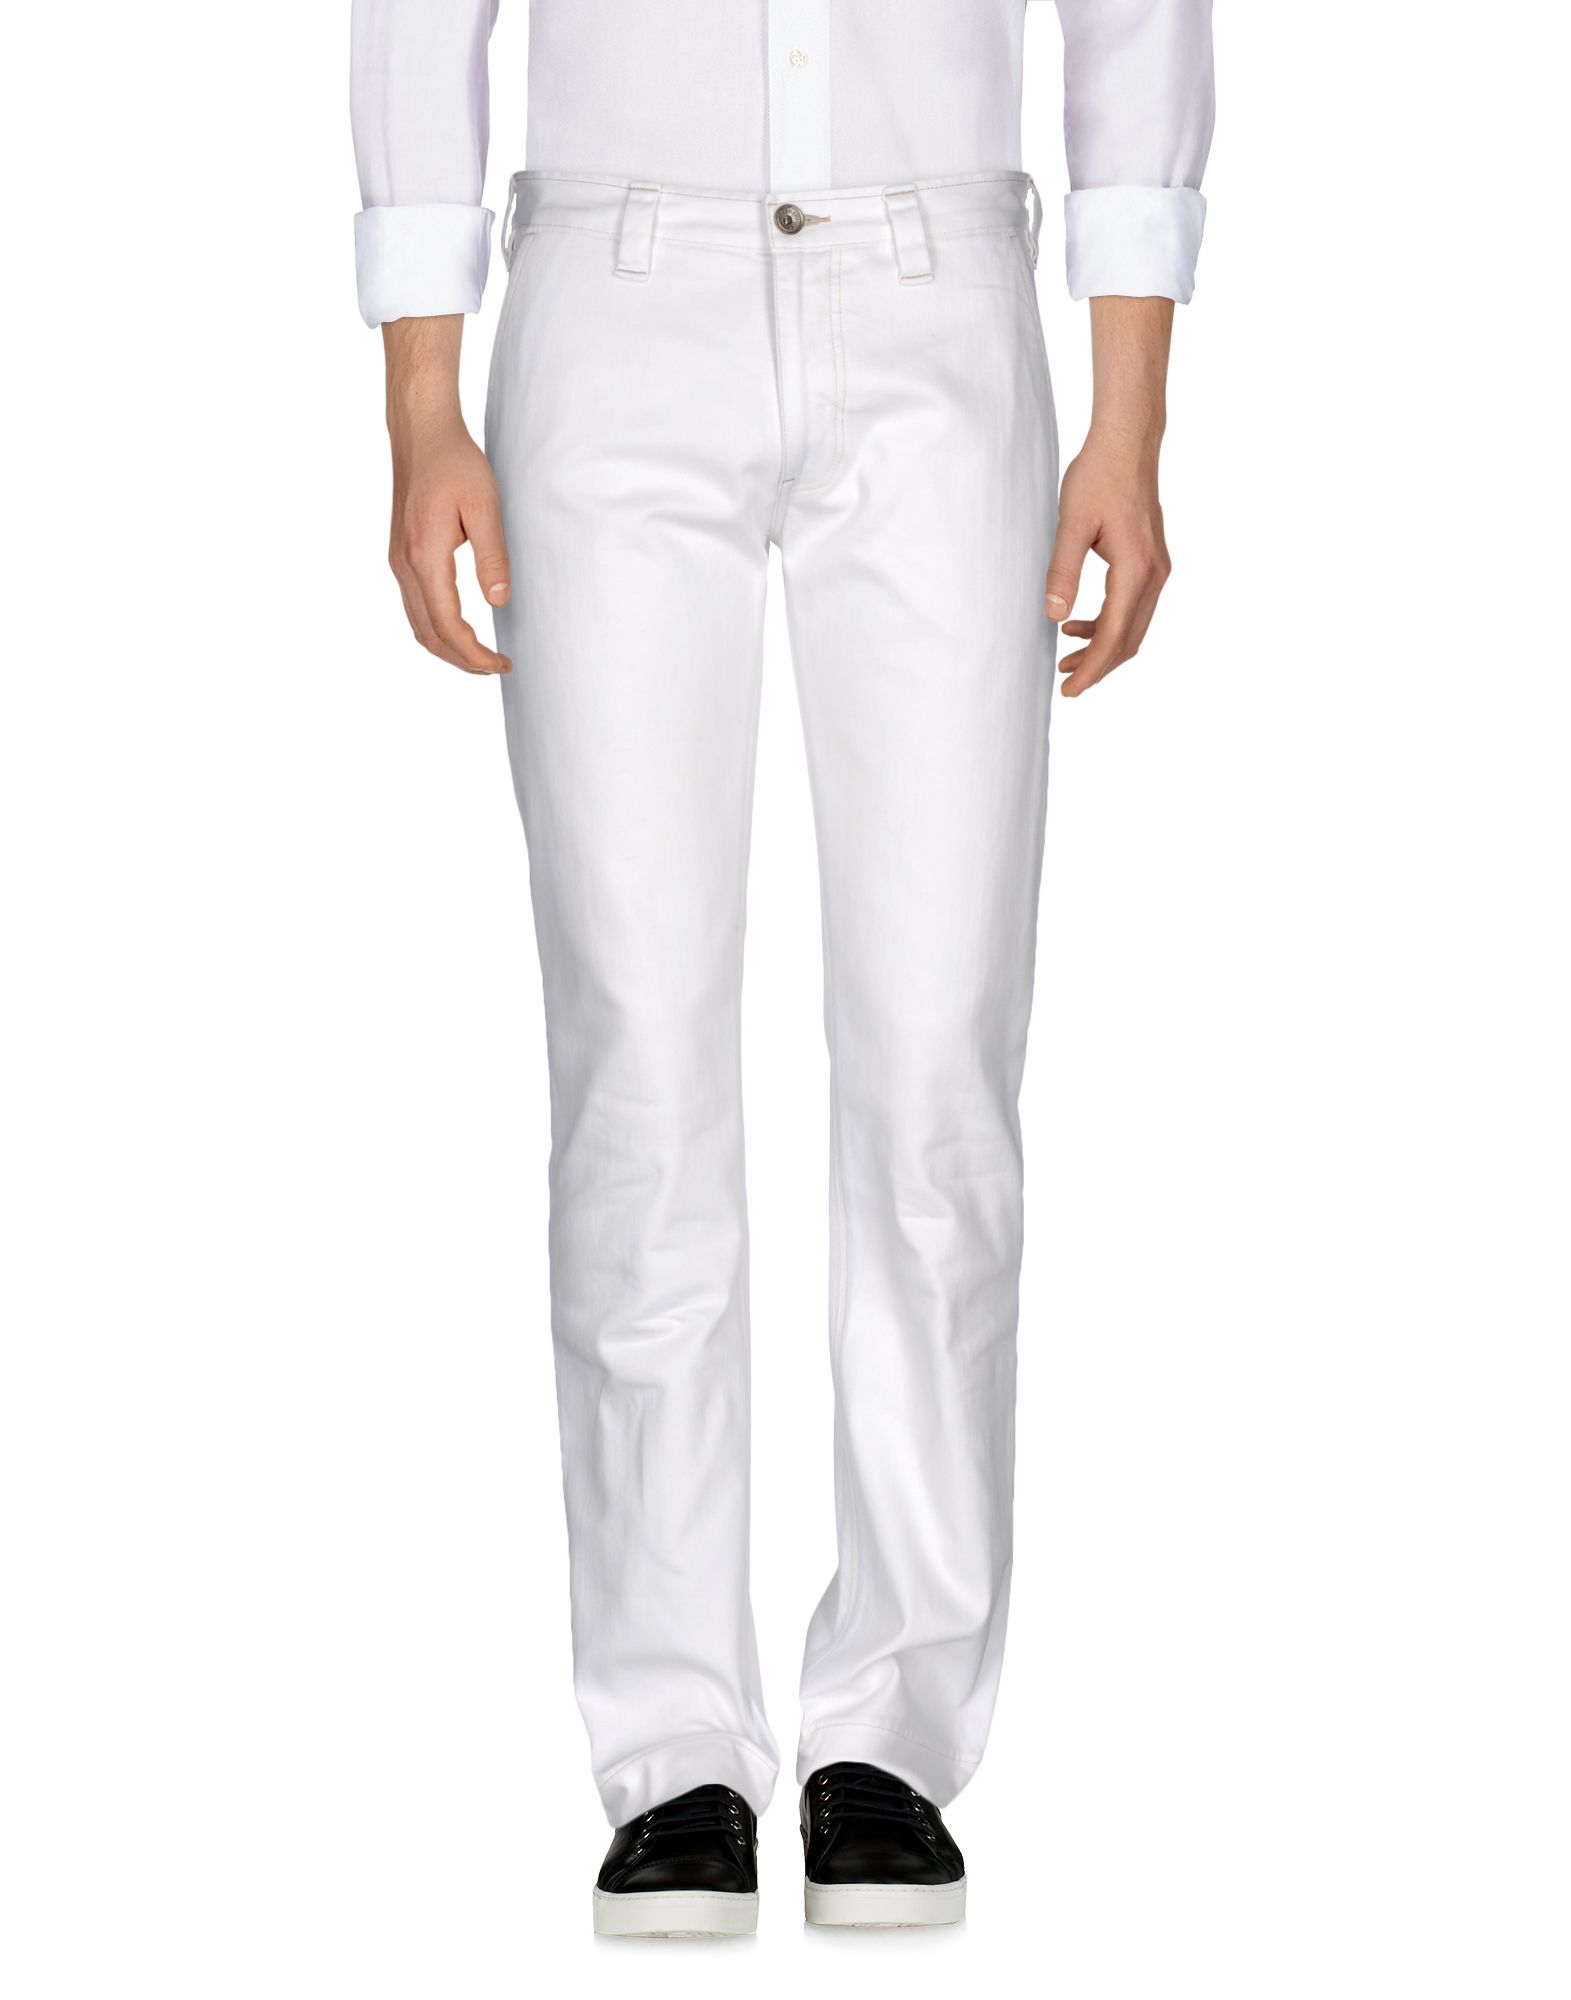 Pantaloni Jeans Armani Jeans Donna - Acquista online su